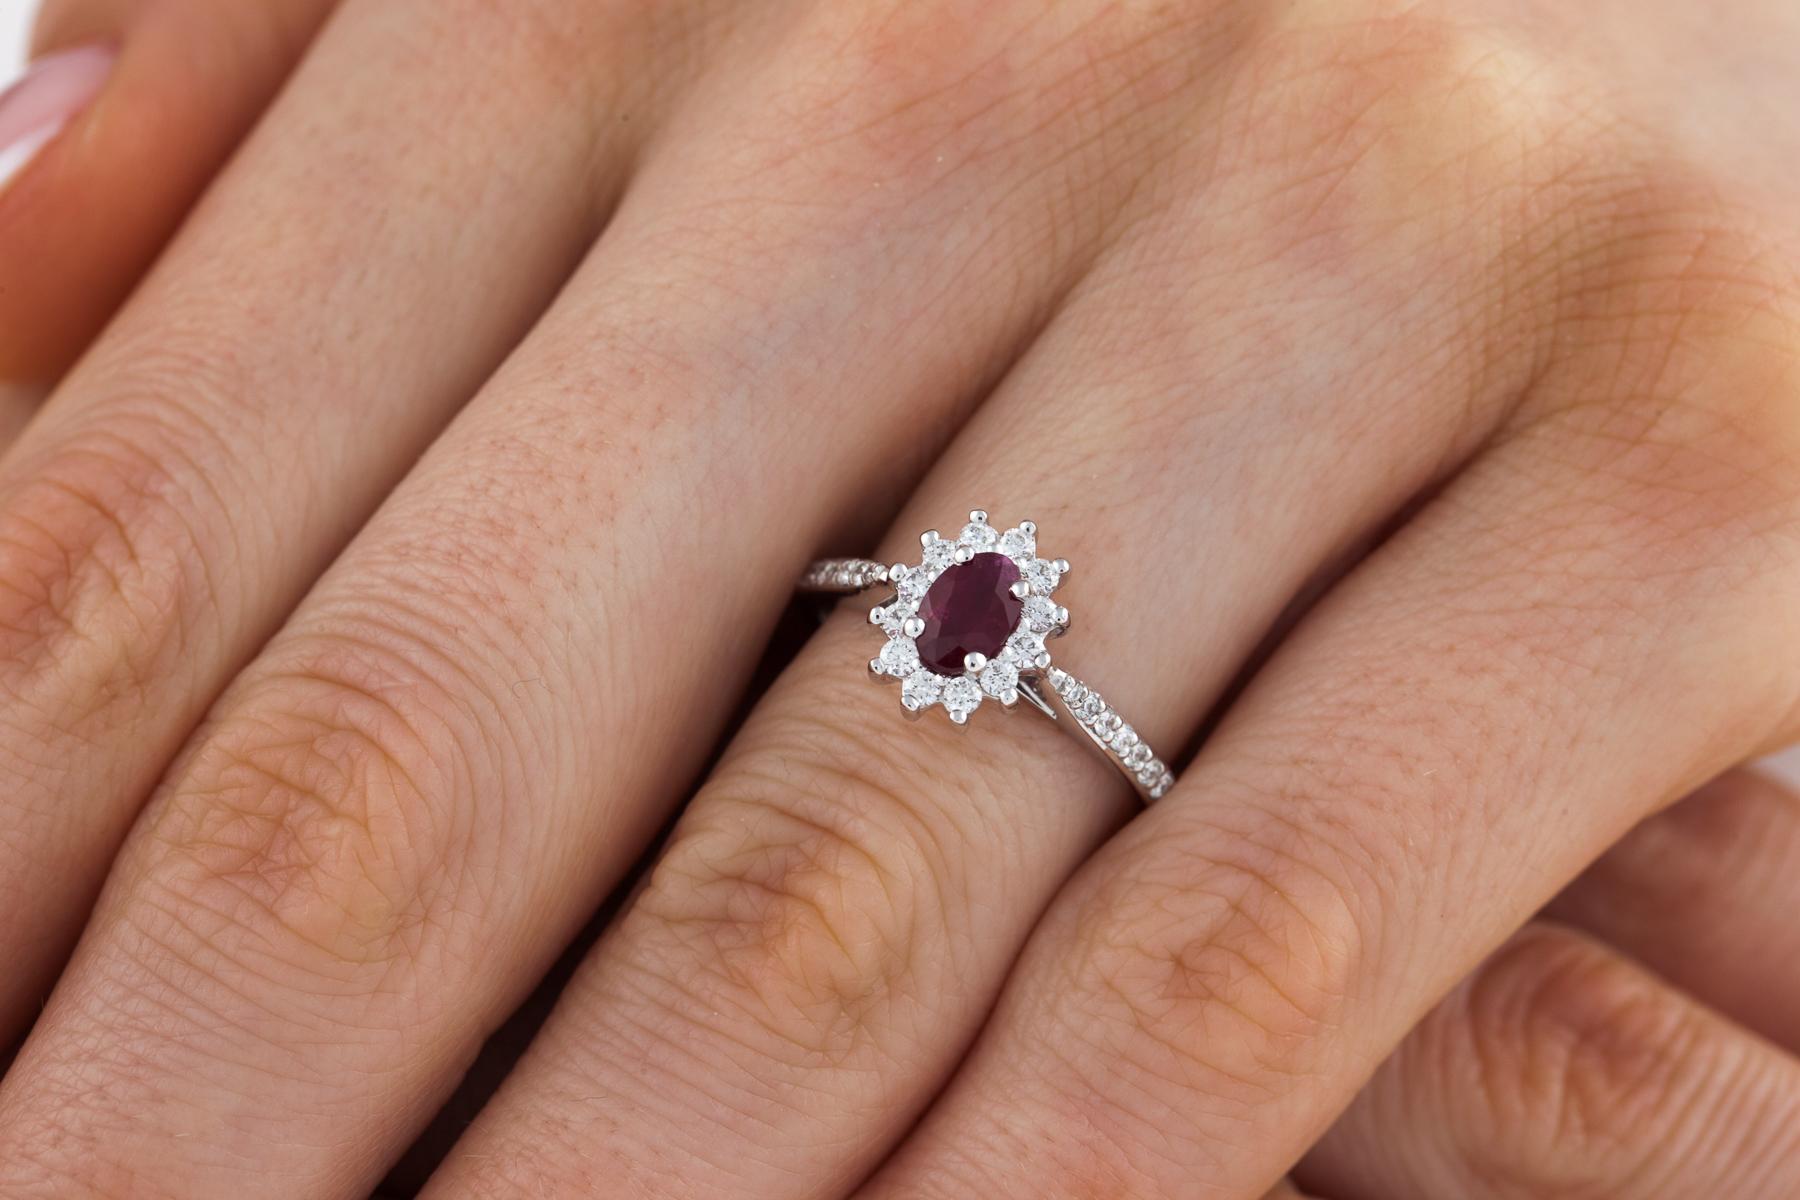 Inel cu Rubin si Diamant Dama Aur Alb 18kt cu un Rubin Oval si Diamante Rotunde in Jur si pe Lateral-img1